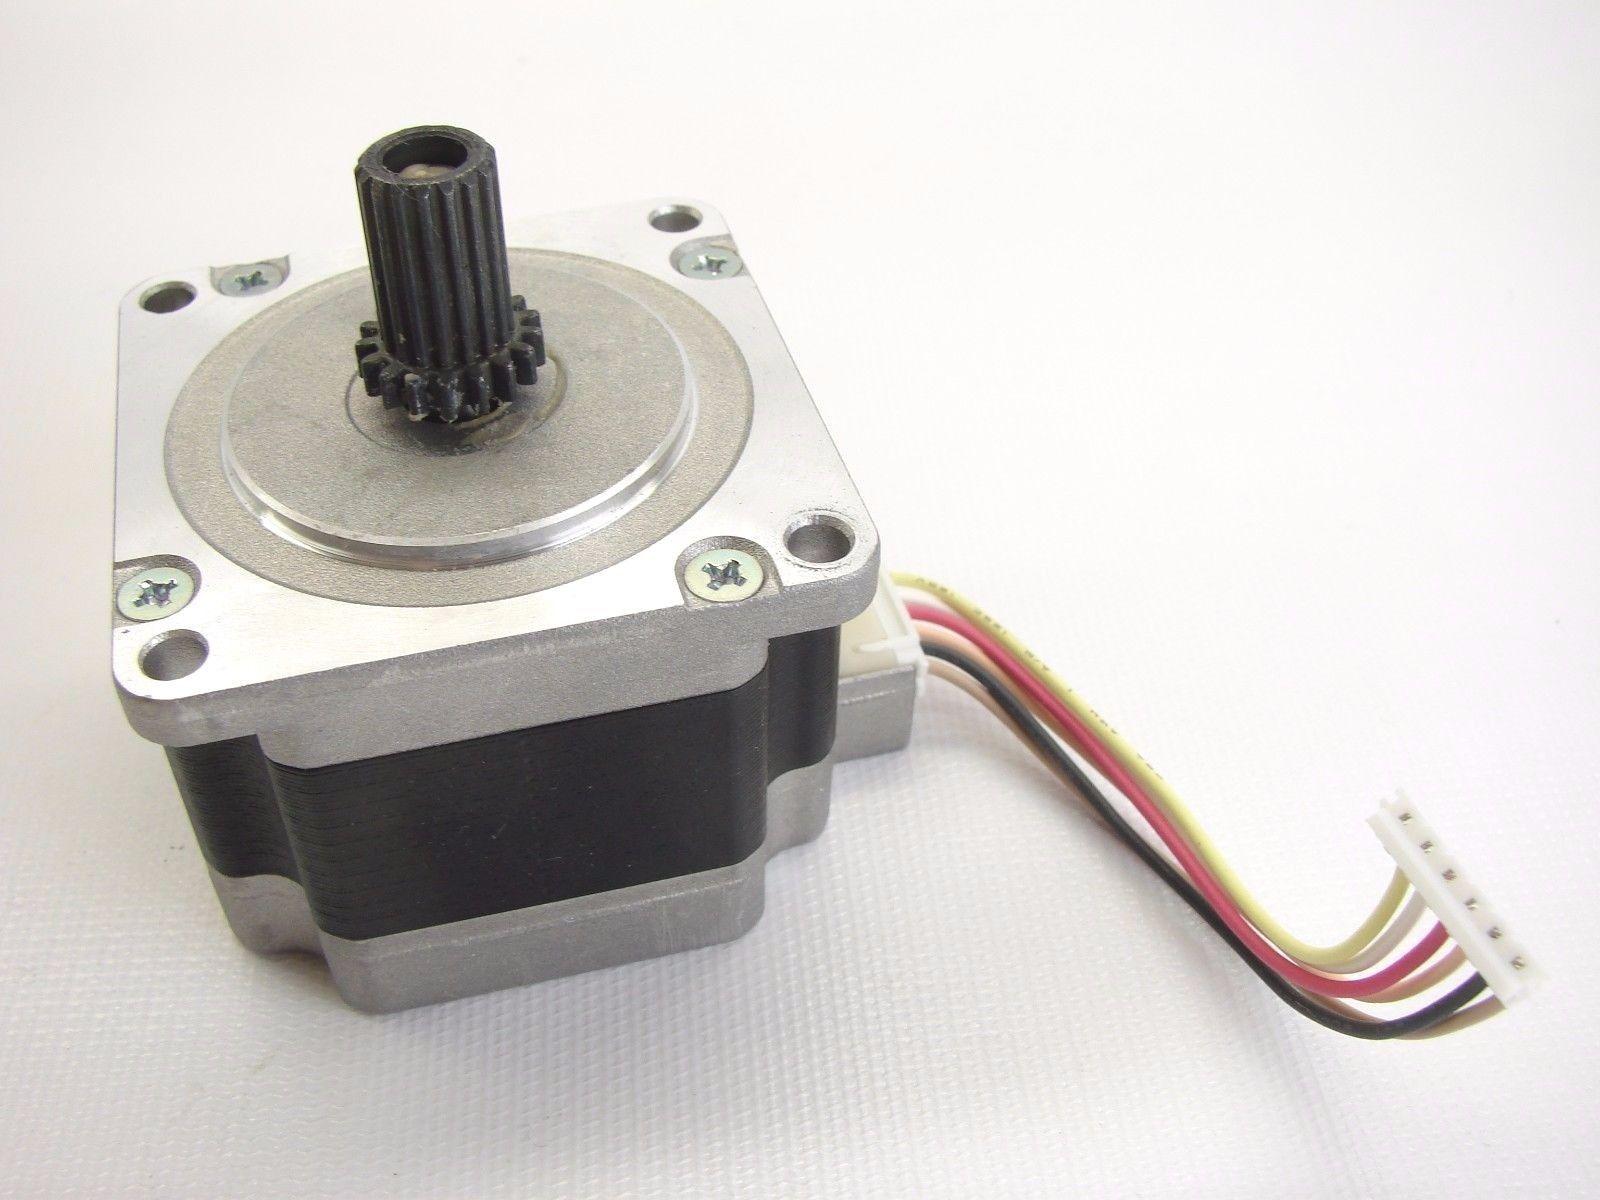 Shinano STP-59D1006 Stepper Motor Zebra S4M Thermal Label Printer 1/8 Deg 1.3ohm